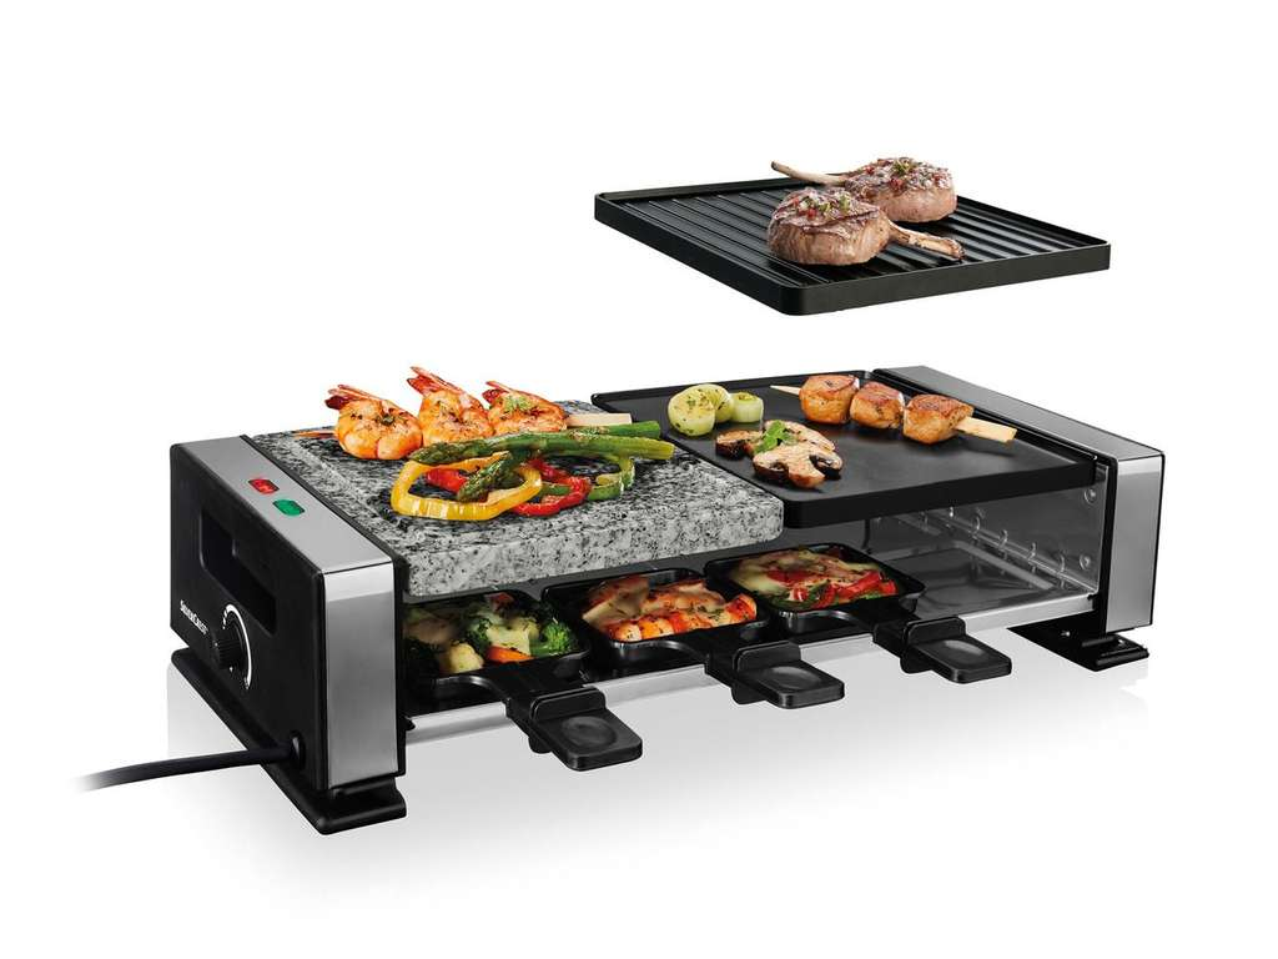 Florabest Holzkohlegrill Ikea : Spitzen lidl grill waru